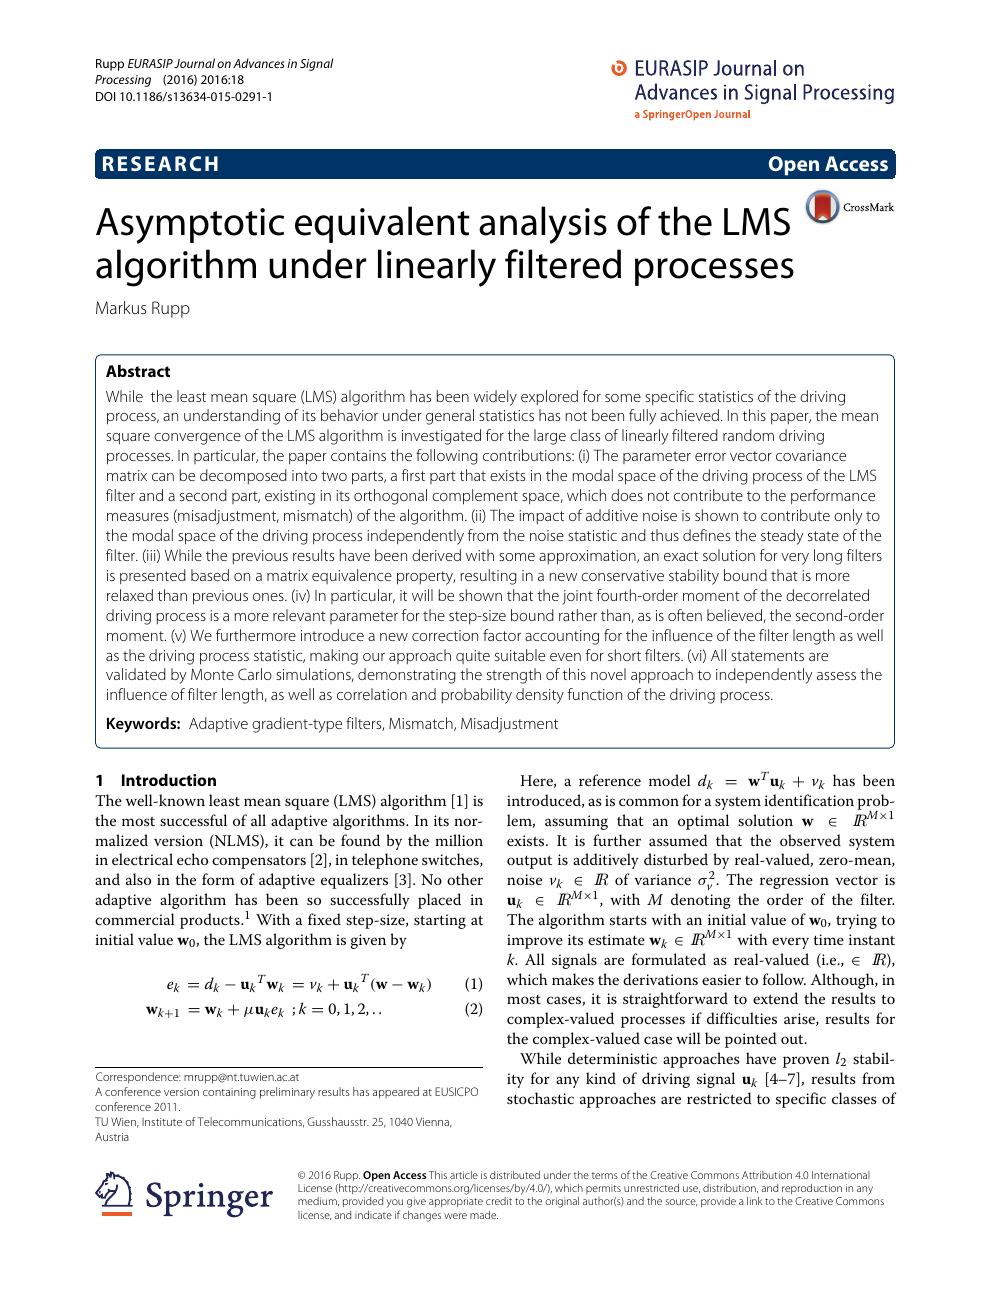 Asymptotic equivalent analysis of the LMS algorithm under